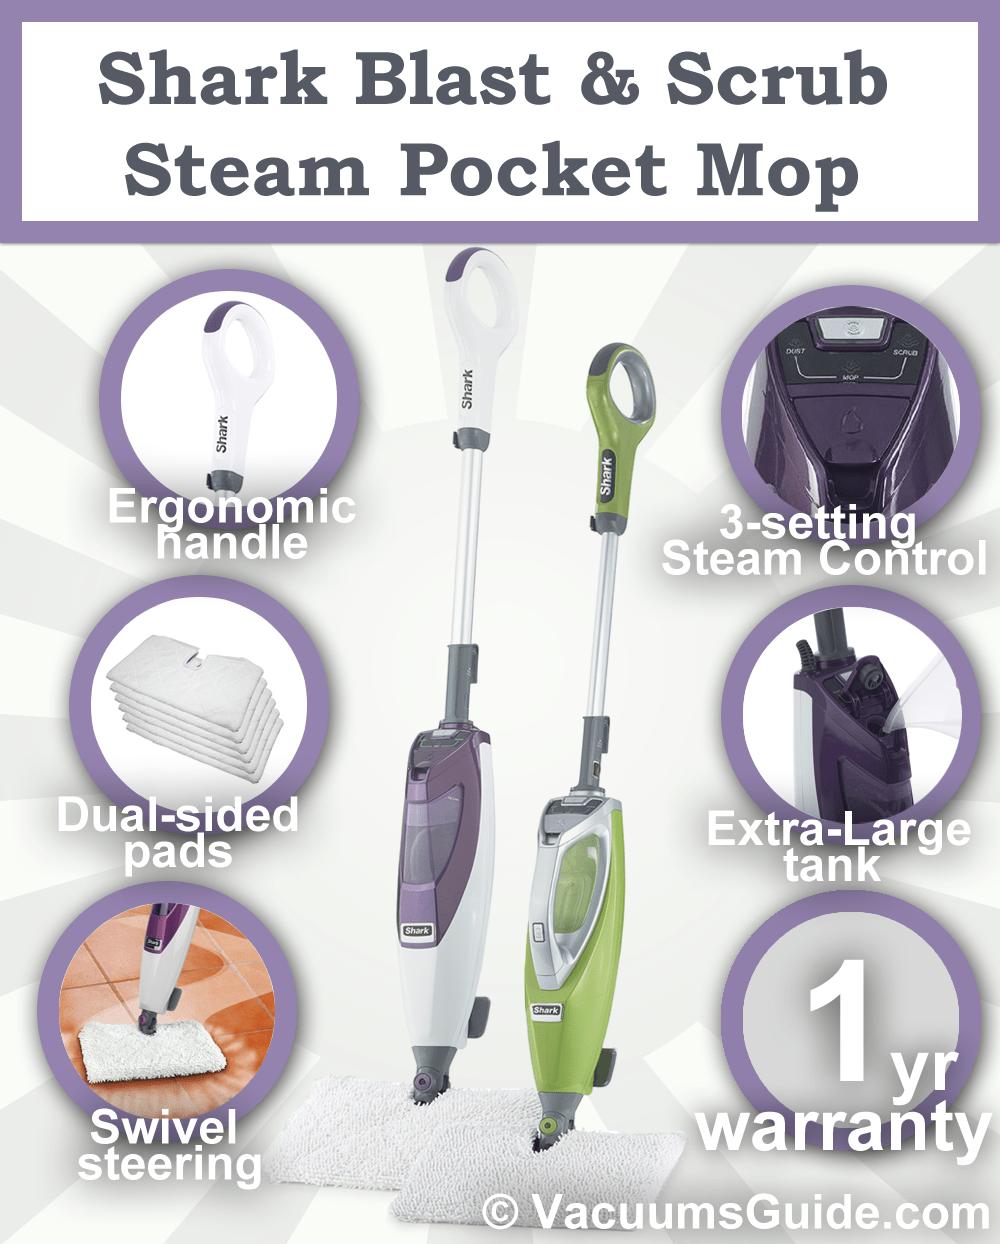 Shark Blast & Scrub Steam Pocket Mop features